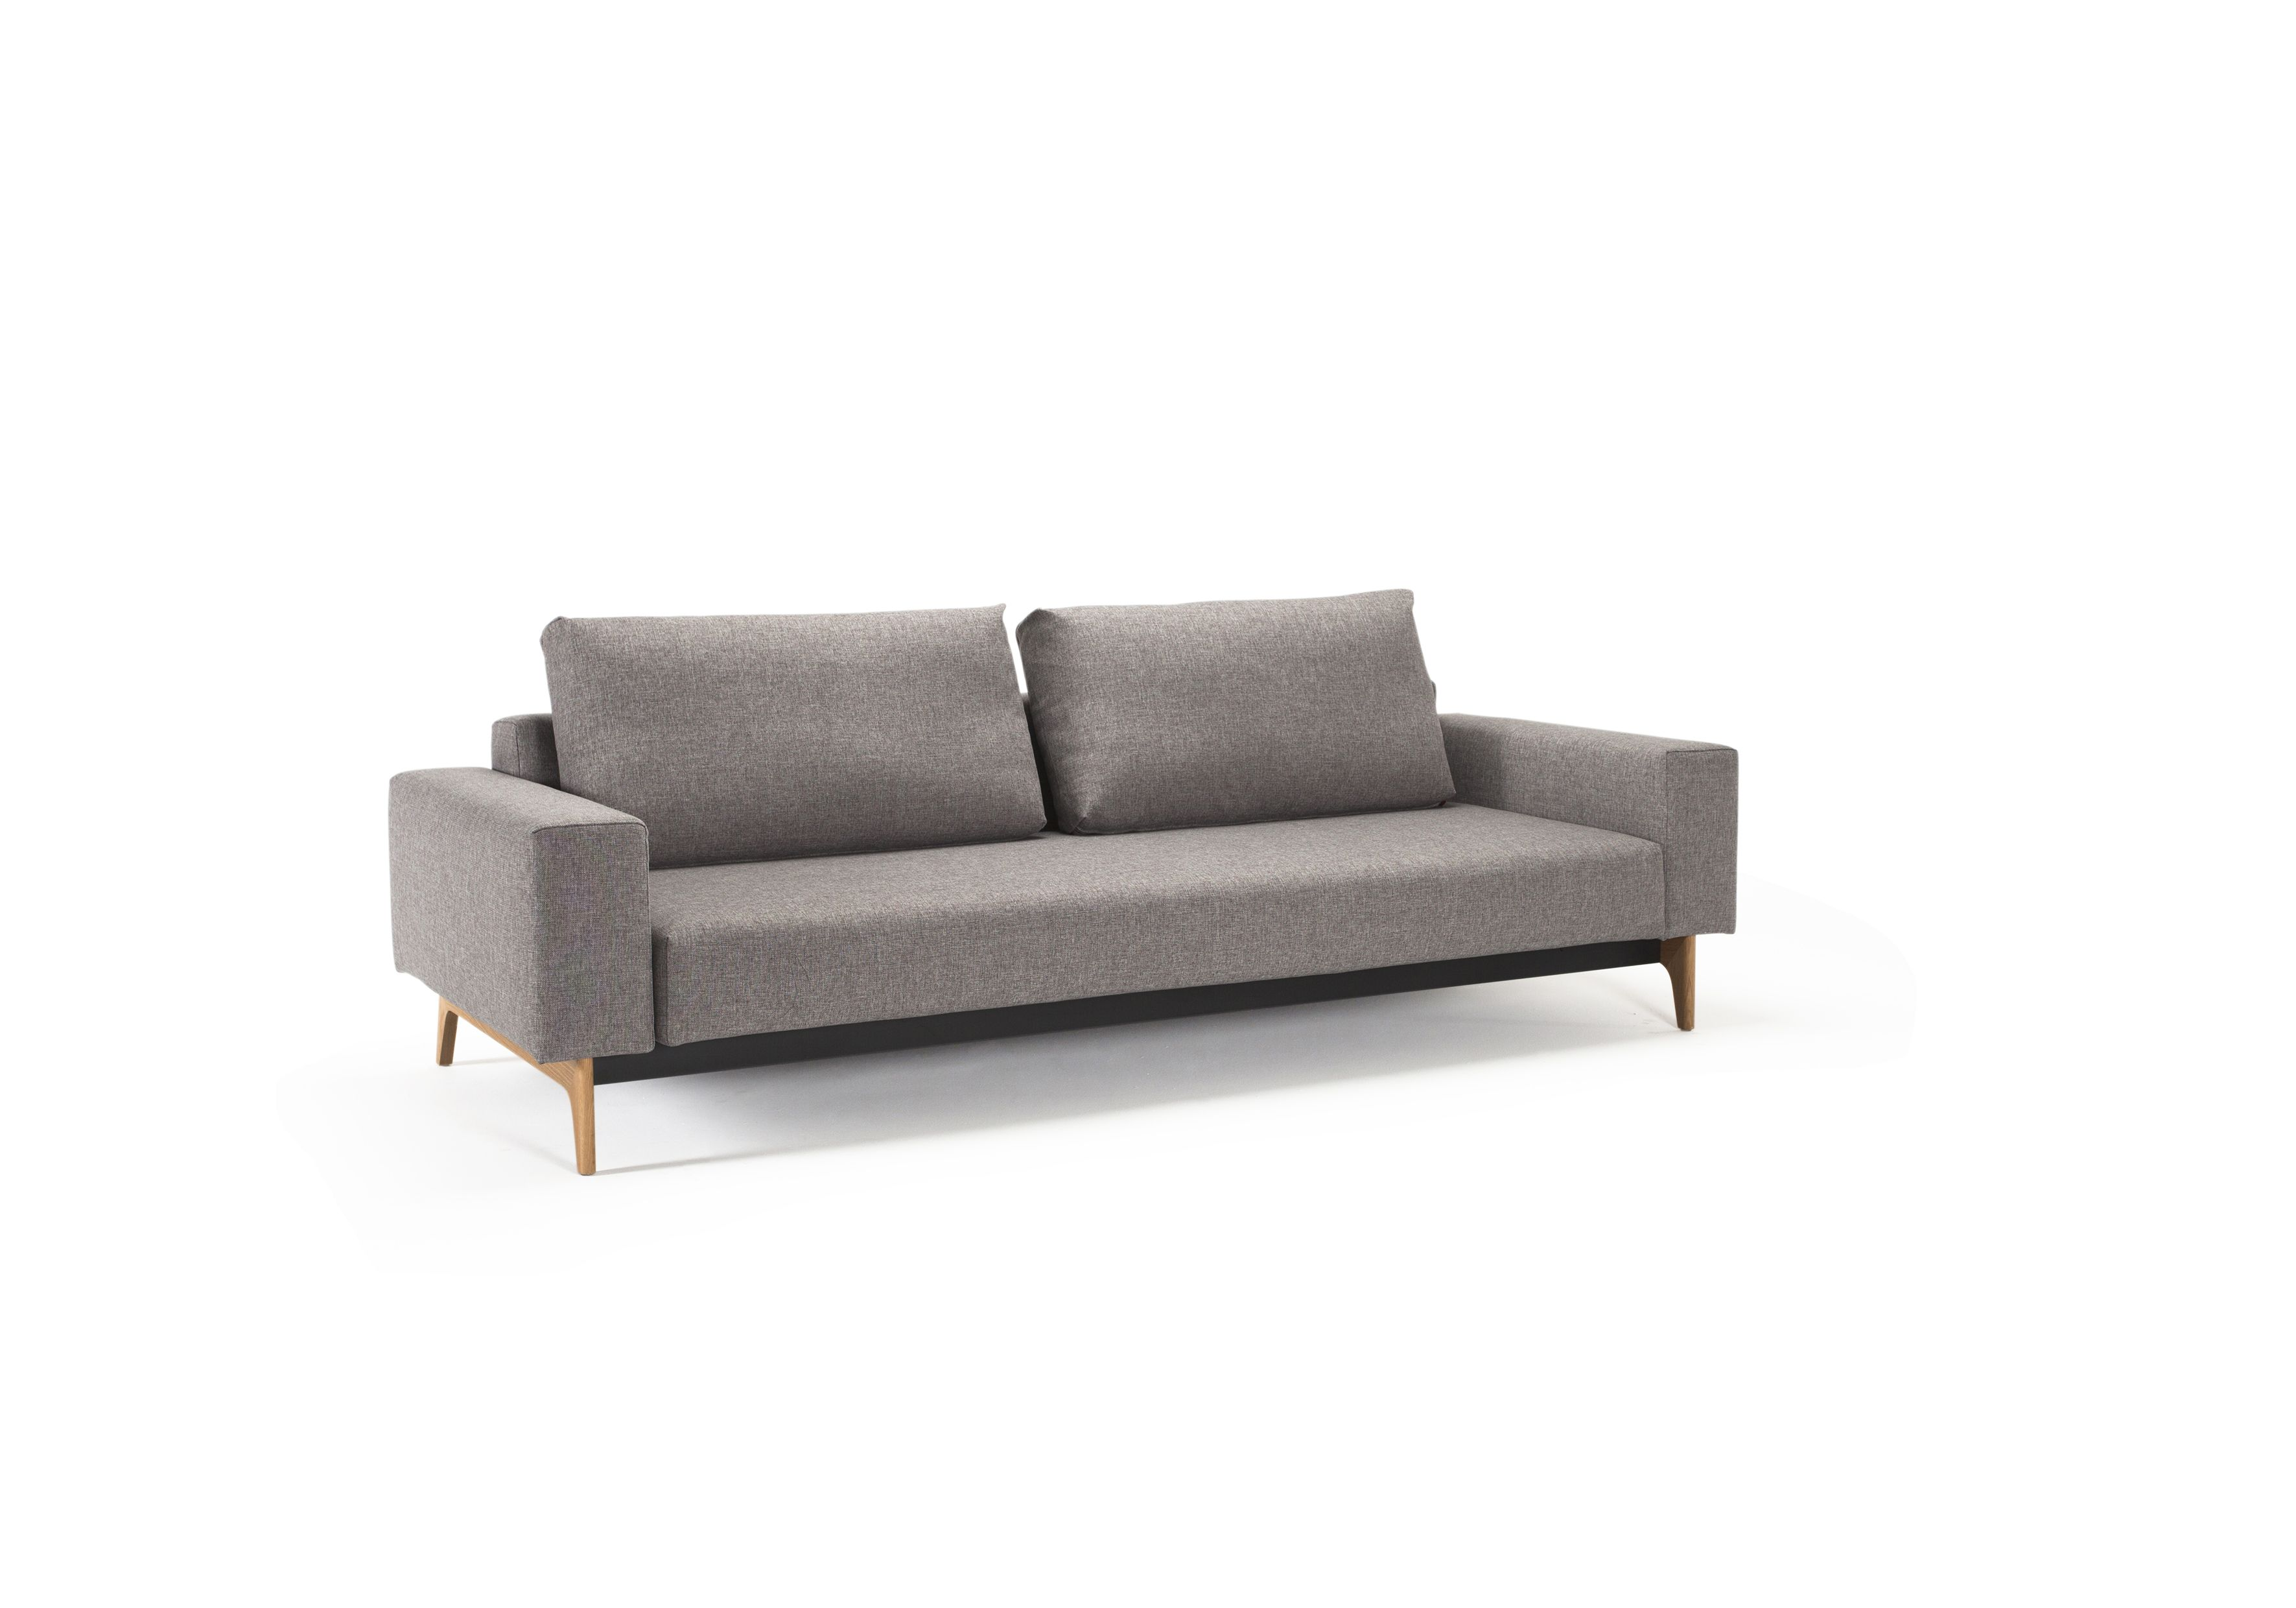 Idun 140 X 200 Cm Schlafsofa Scandinavian Design Sofa Grey Sofa Bed Modern Sofa Bed